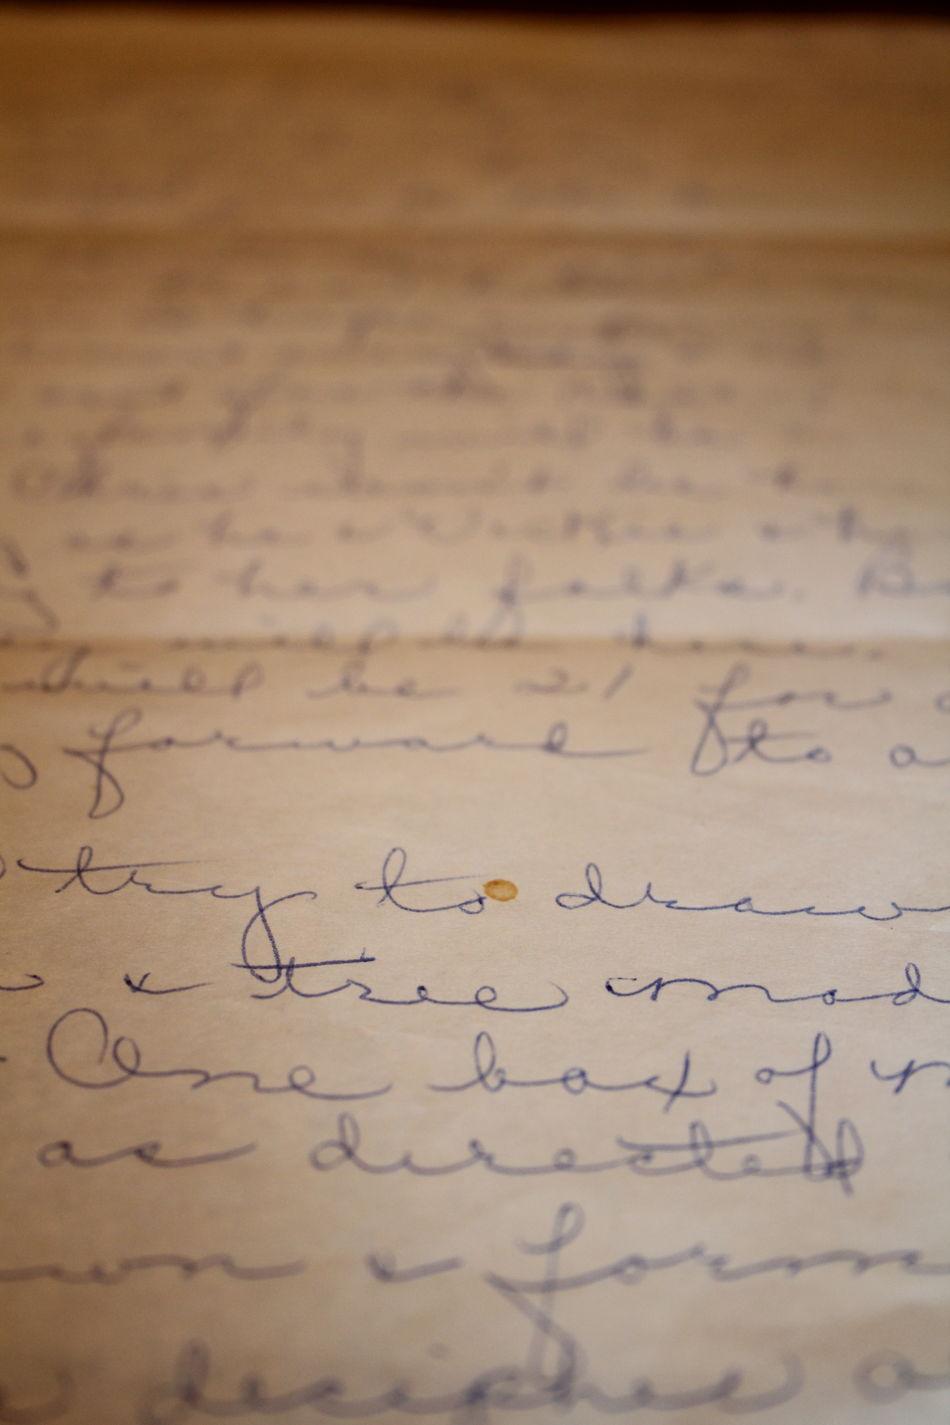 1989 Cursive Cursive Writing Grandma Grandmother Letter Old Paper Recipe Worn